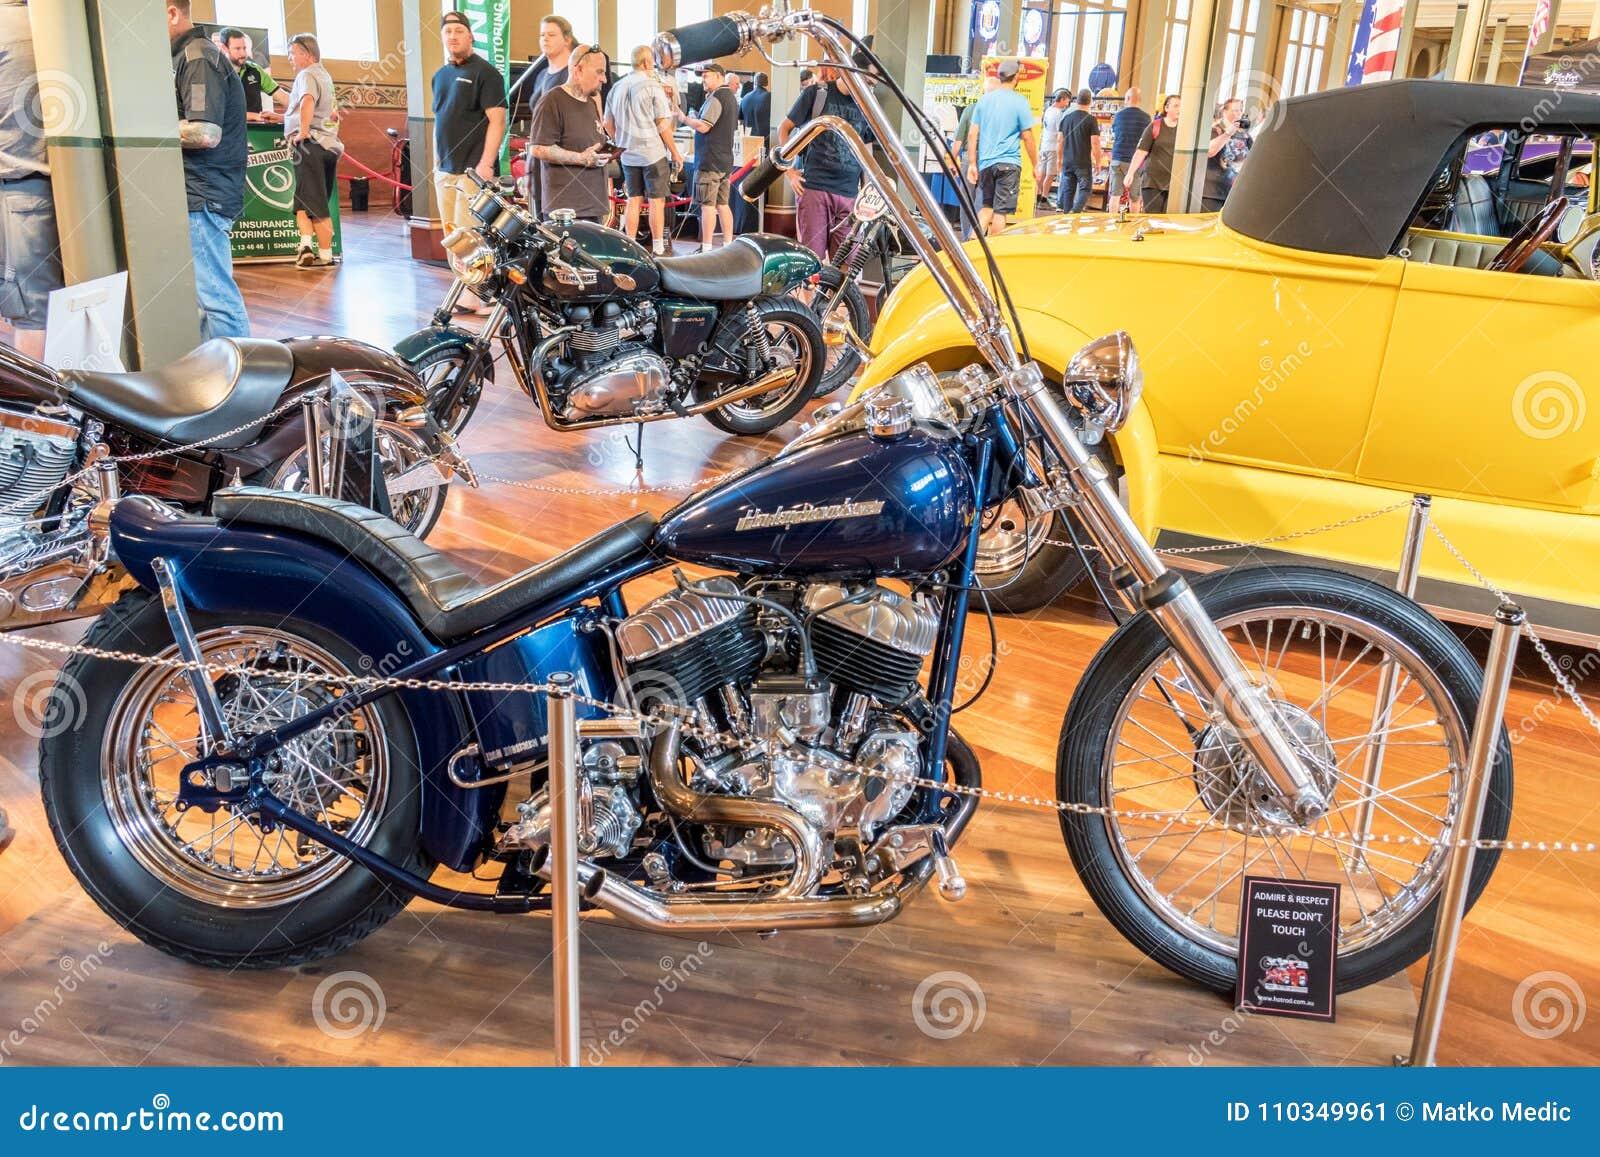 Harley Davidson Hot Rod Motorcycle Editorial Photo Image